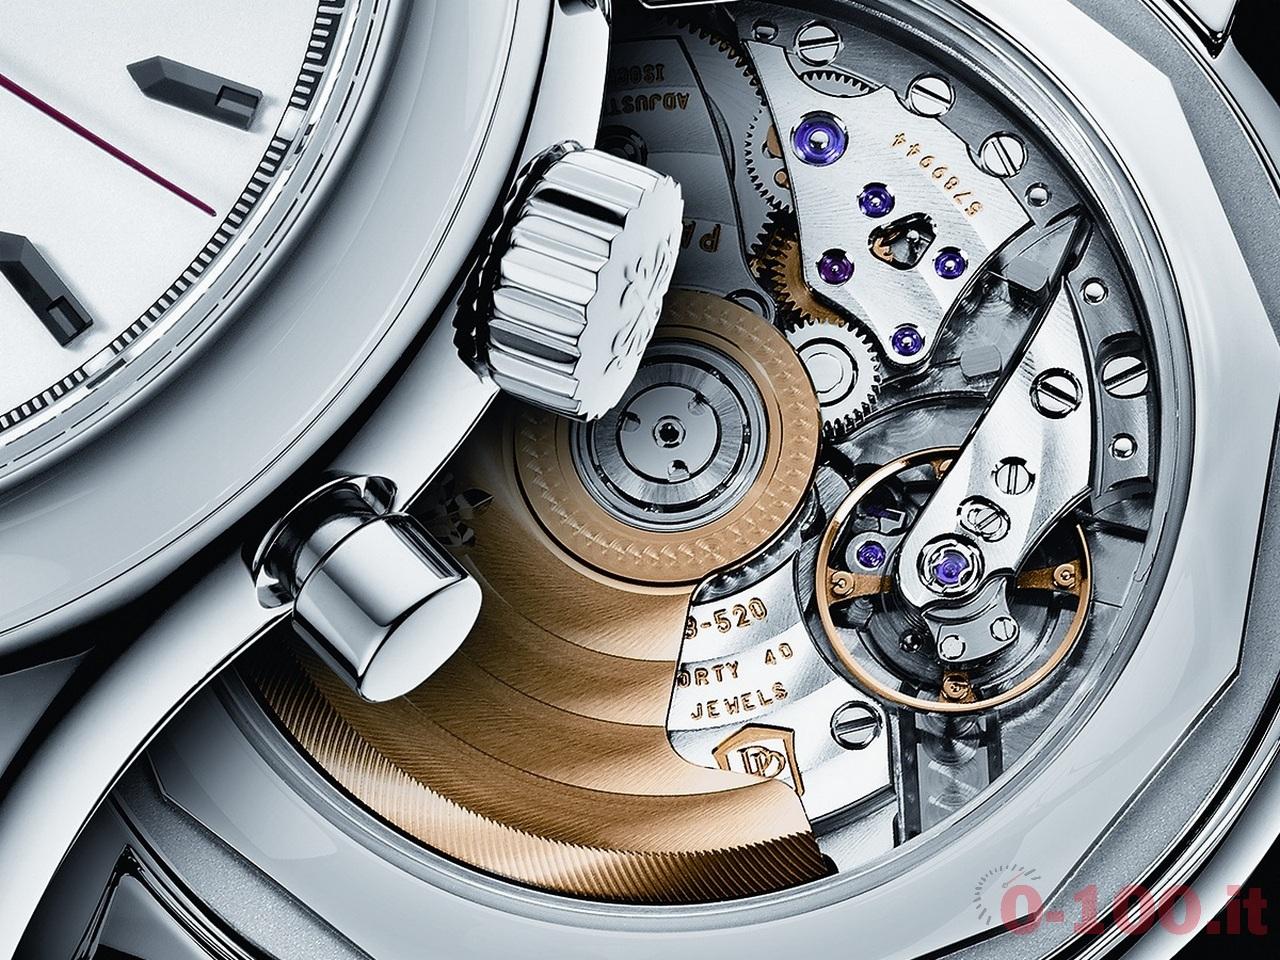 patek-philippe-cronografo-calendario-annuale-ref-59601a-001_0-1004